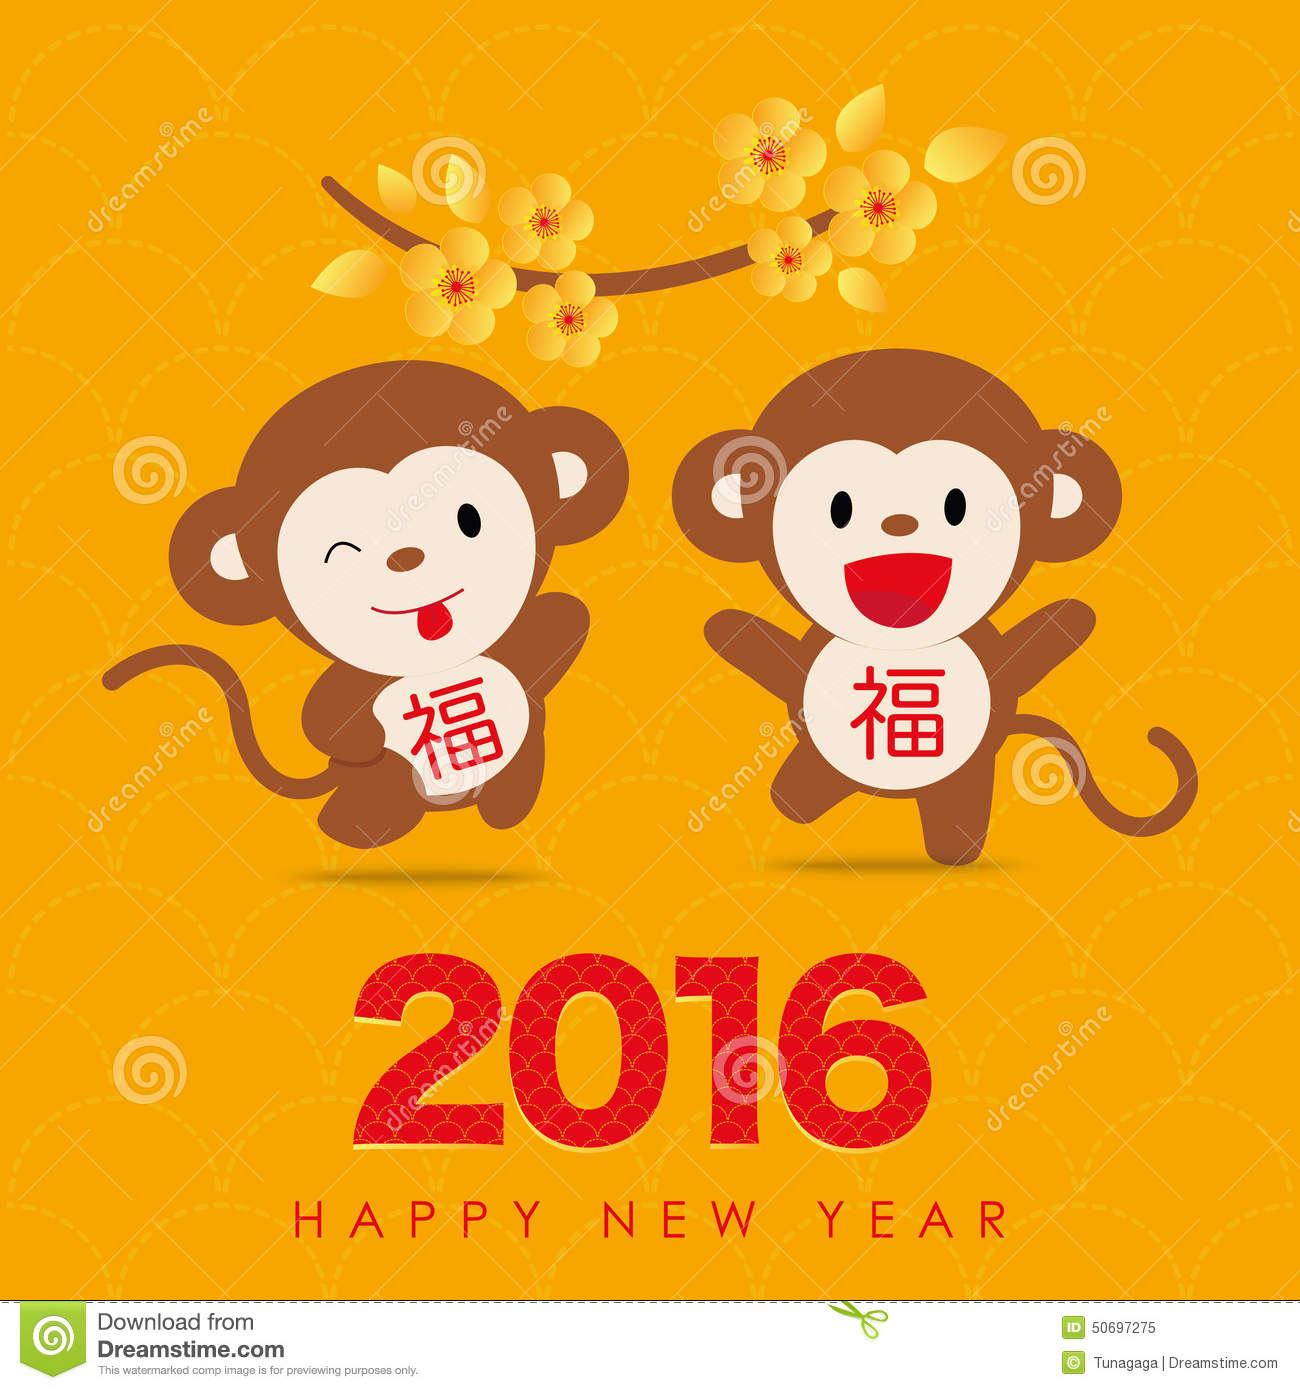 2016 Monkey Chinese New Year.